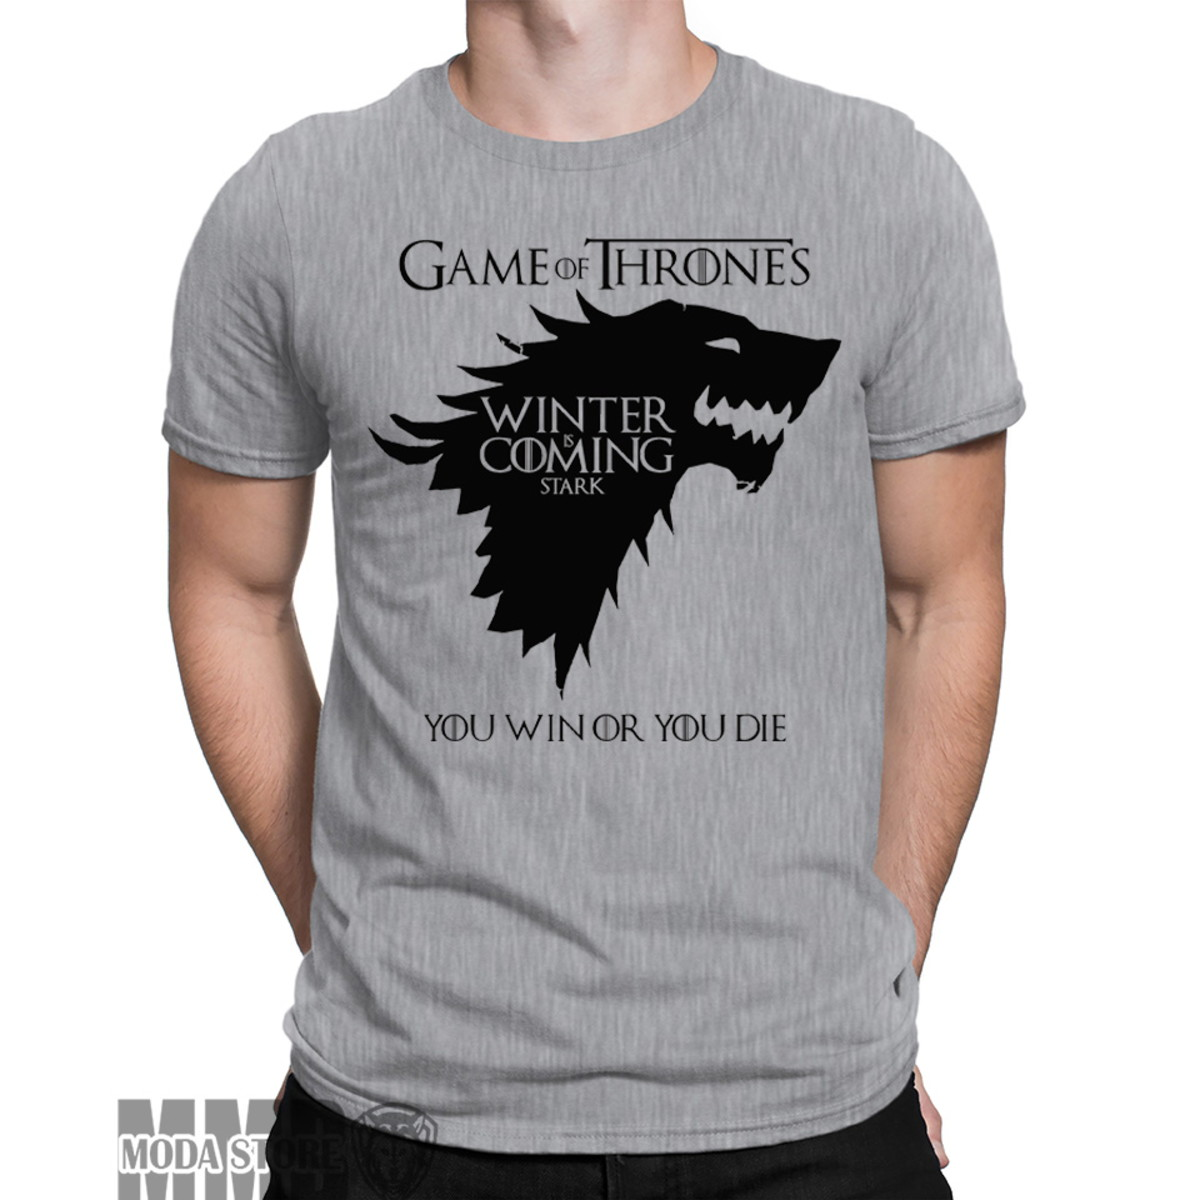 c81e775f4 Camiseta Camisa Game Of Thrones Jon Snow Casa Stark Geek no Elo7 ...